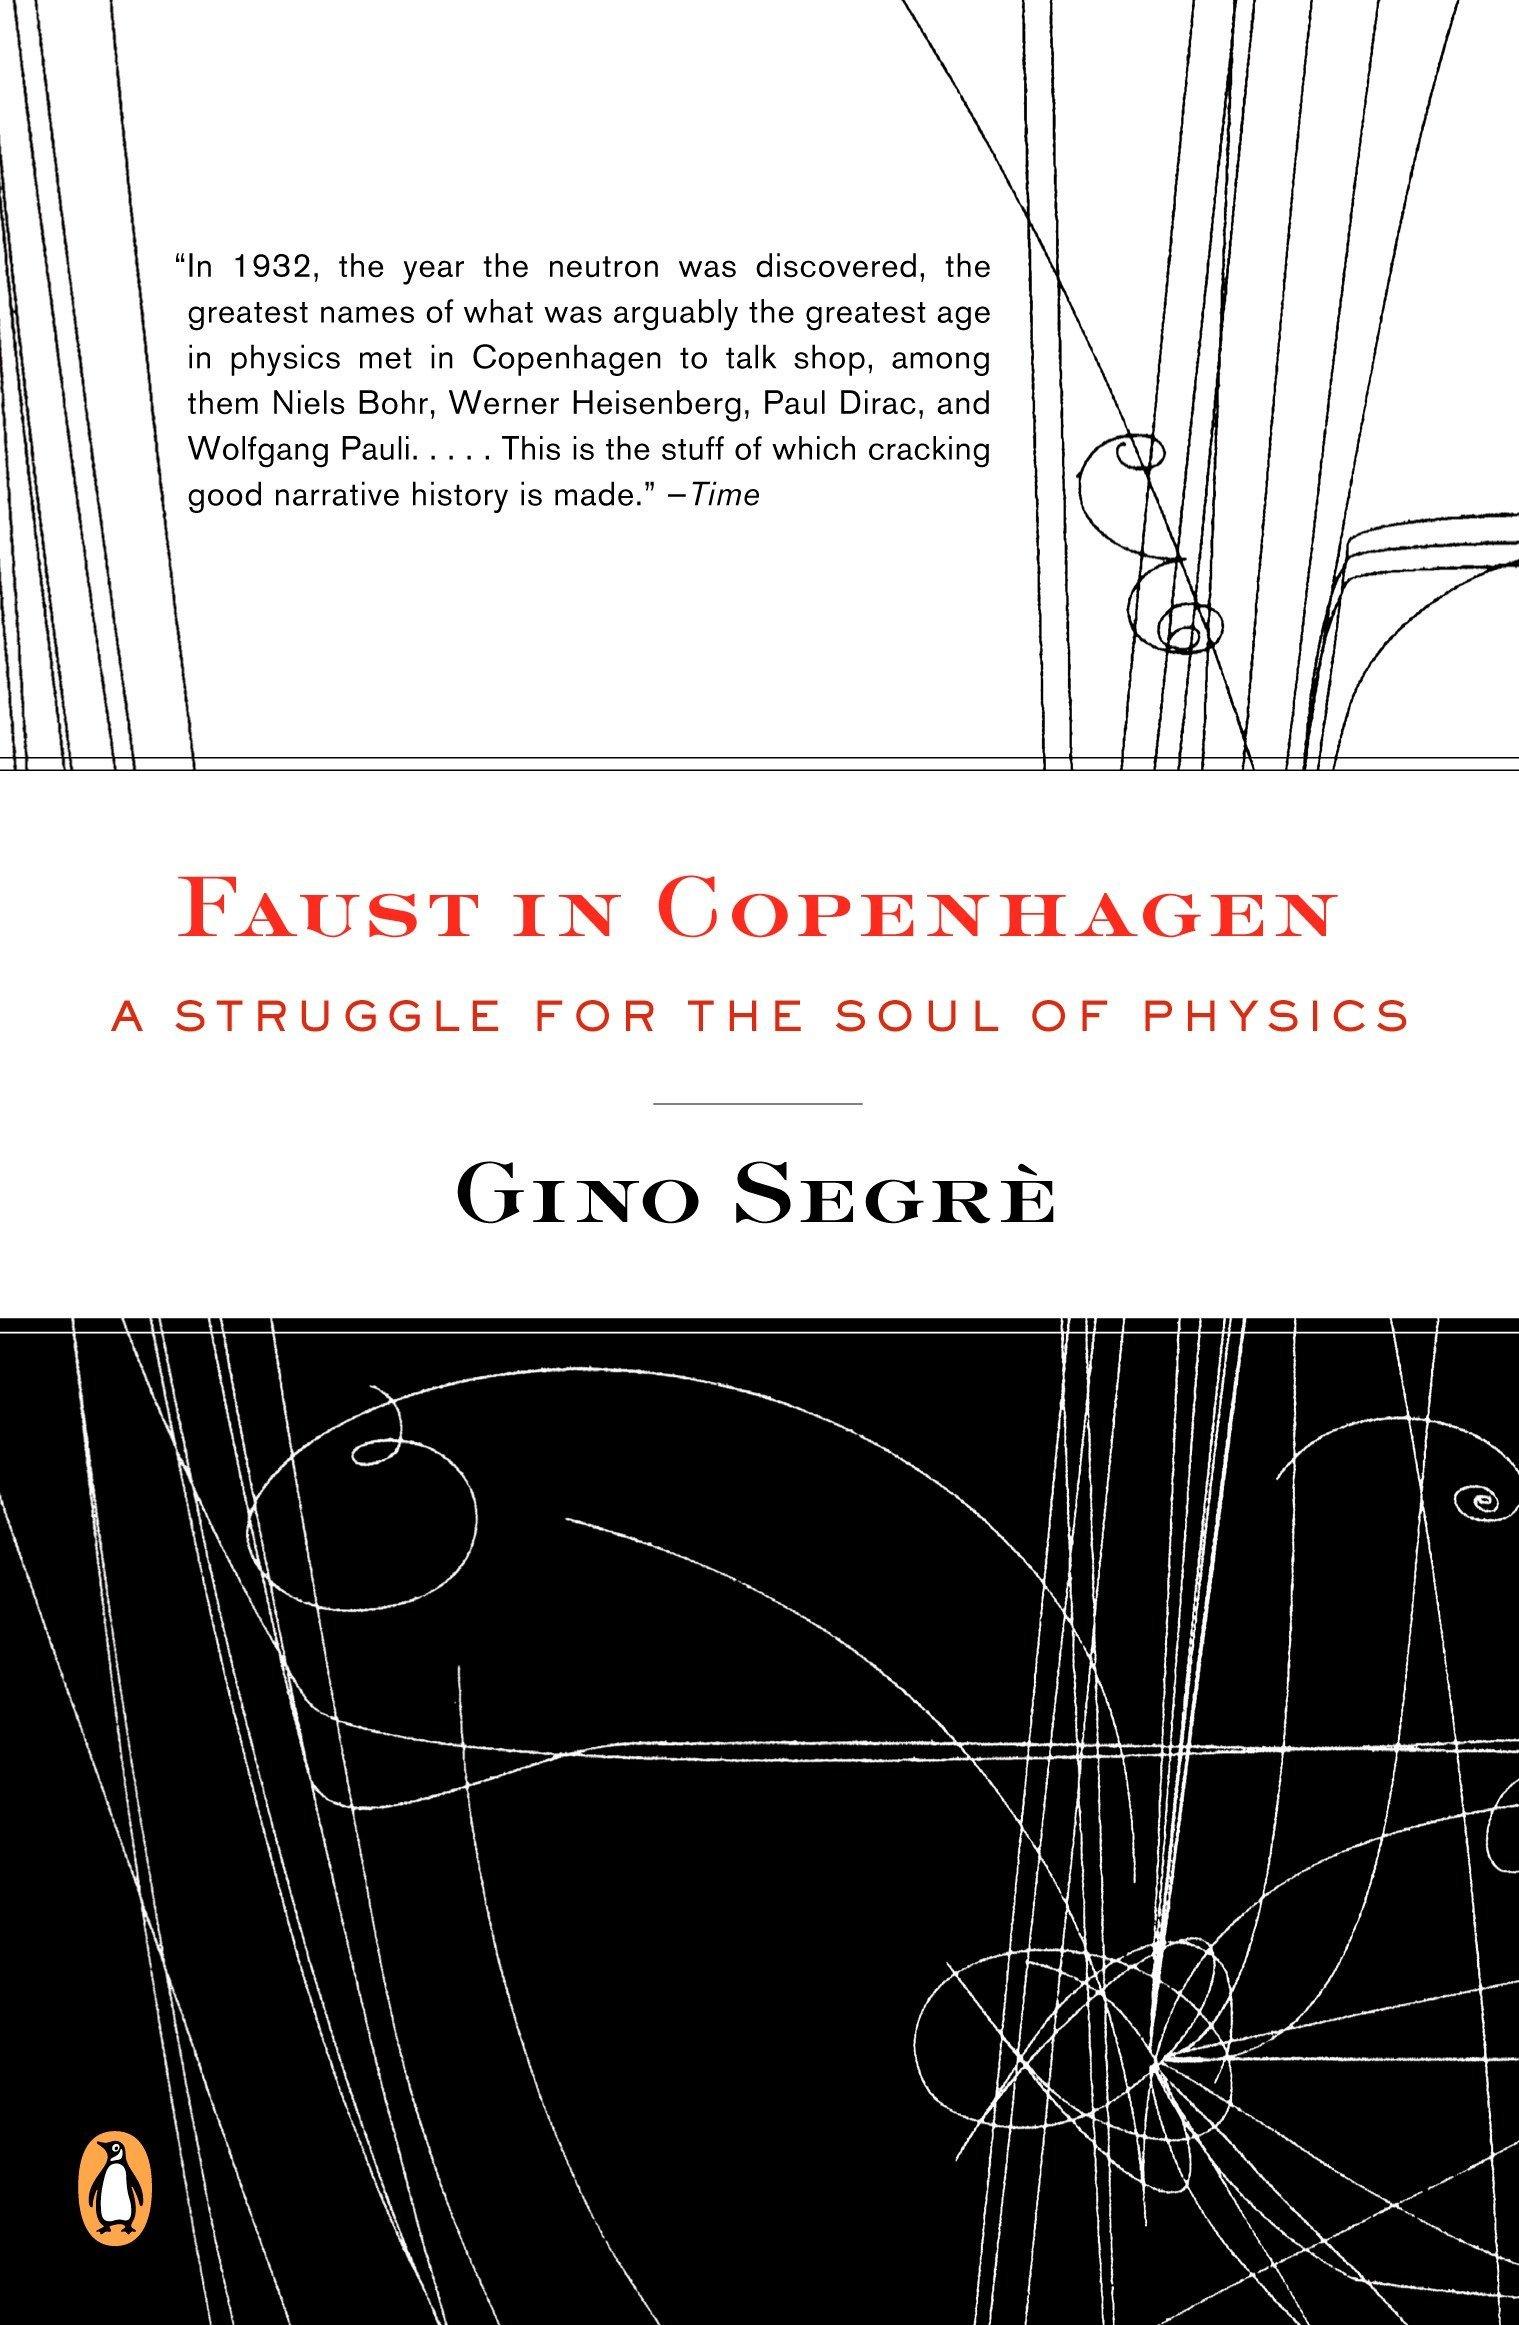 faust in copenhagen a struggle for the soul of physics gino segre